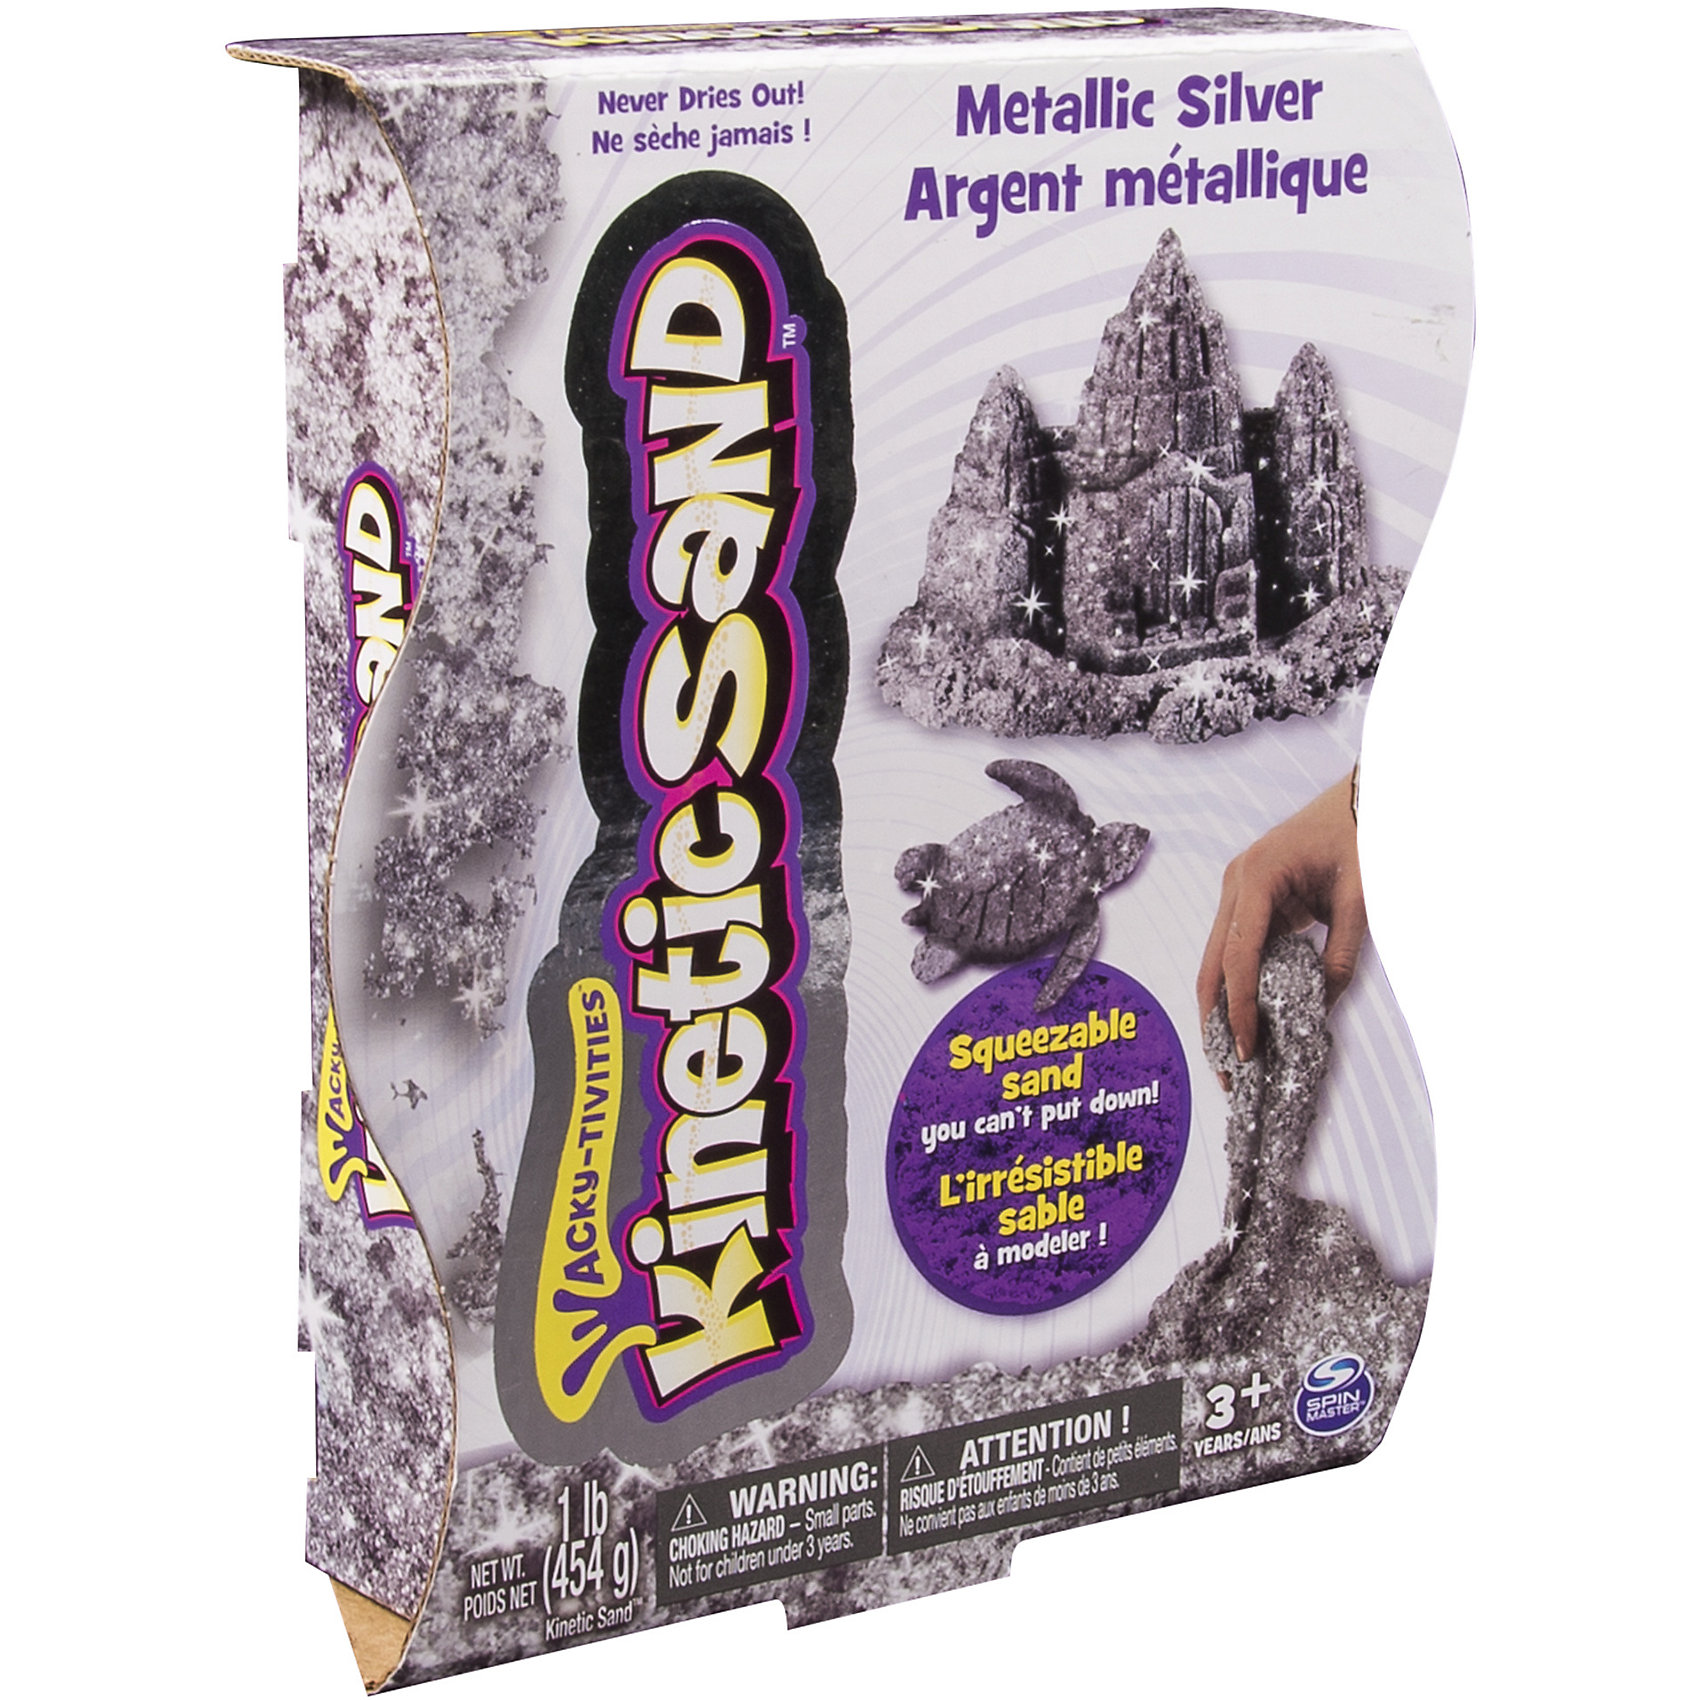 Kinetic sand Песок для лепки Kinetic sand, металлик серебряный, 455гр кинетический песок kinetic sand золотой